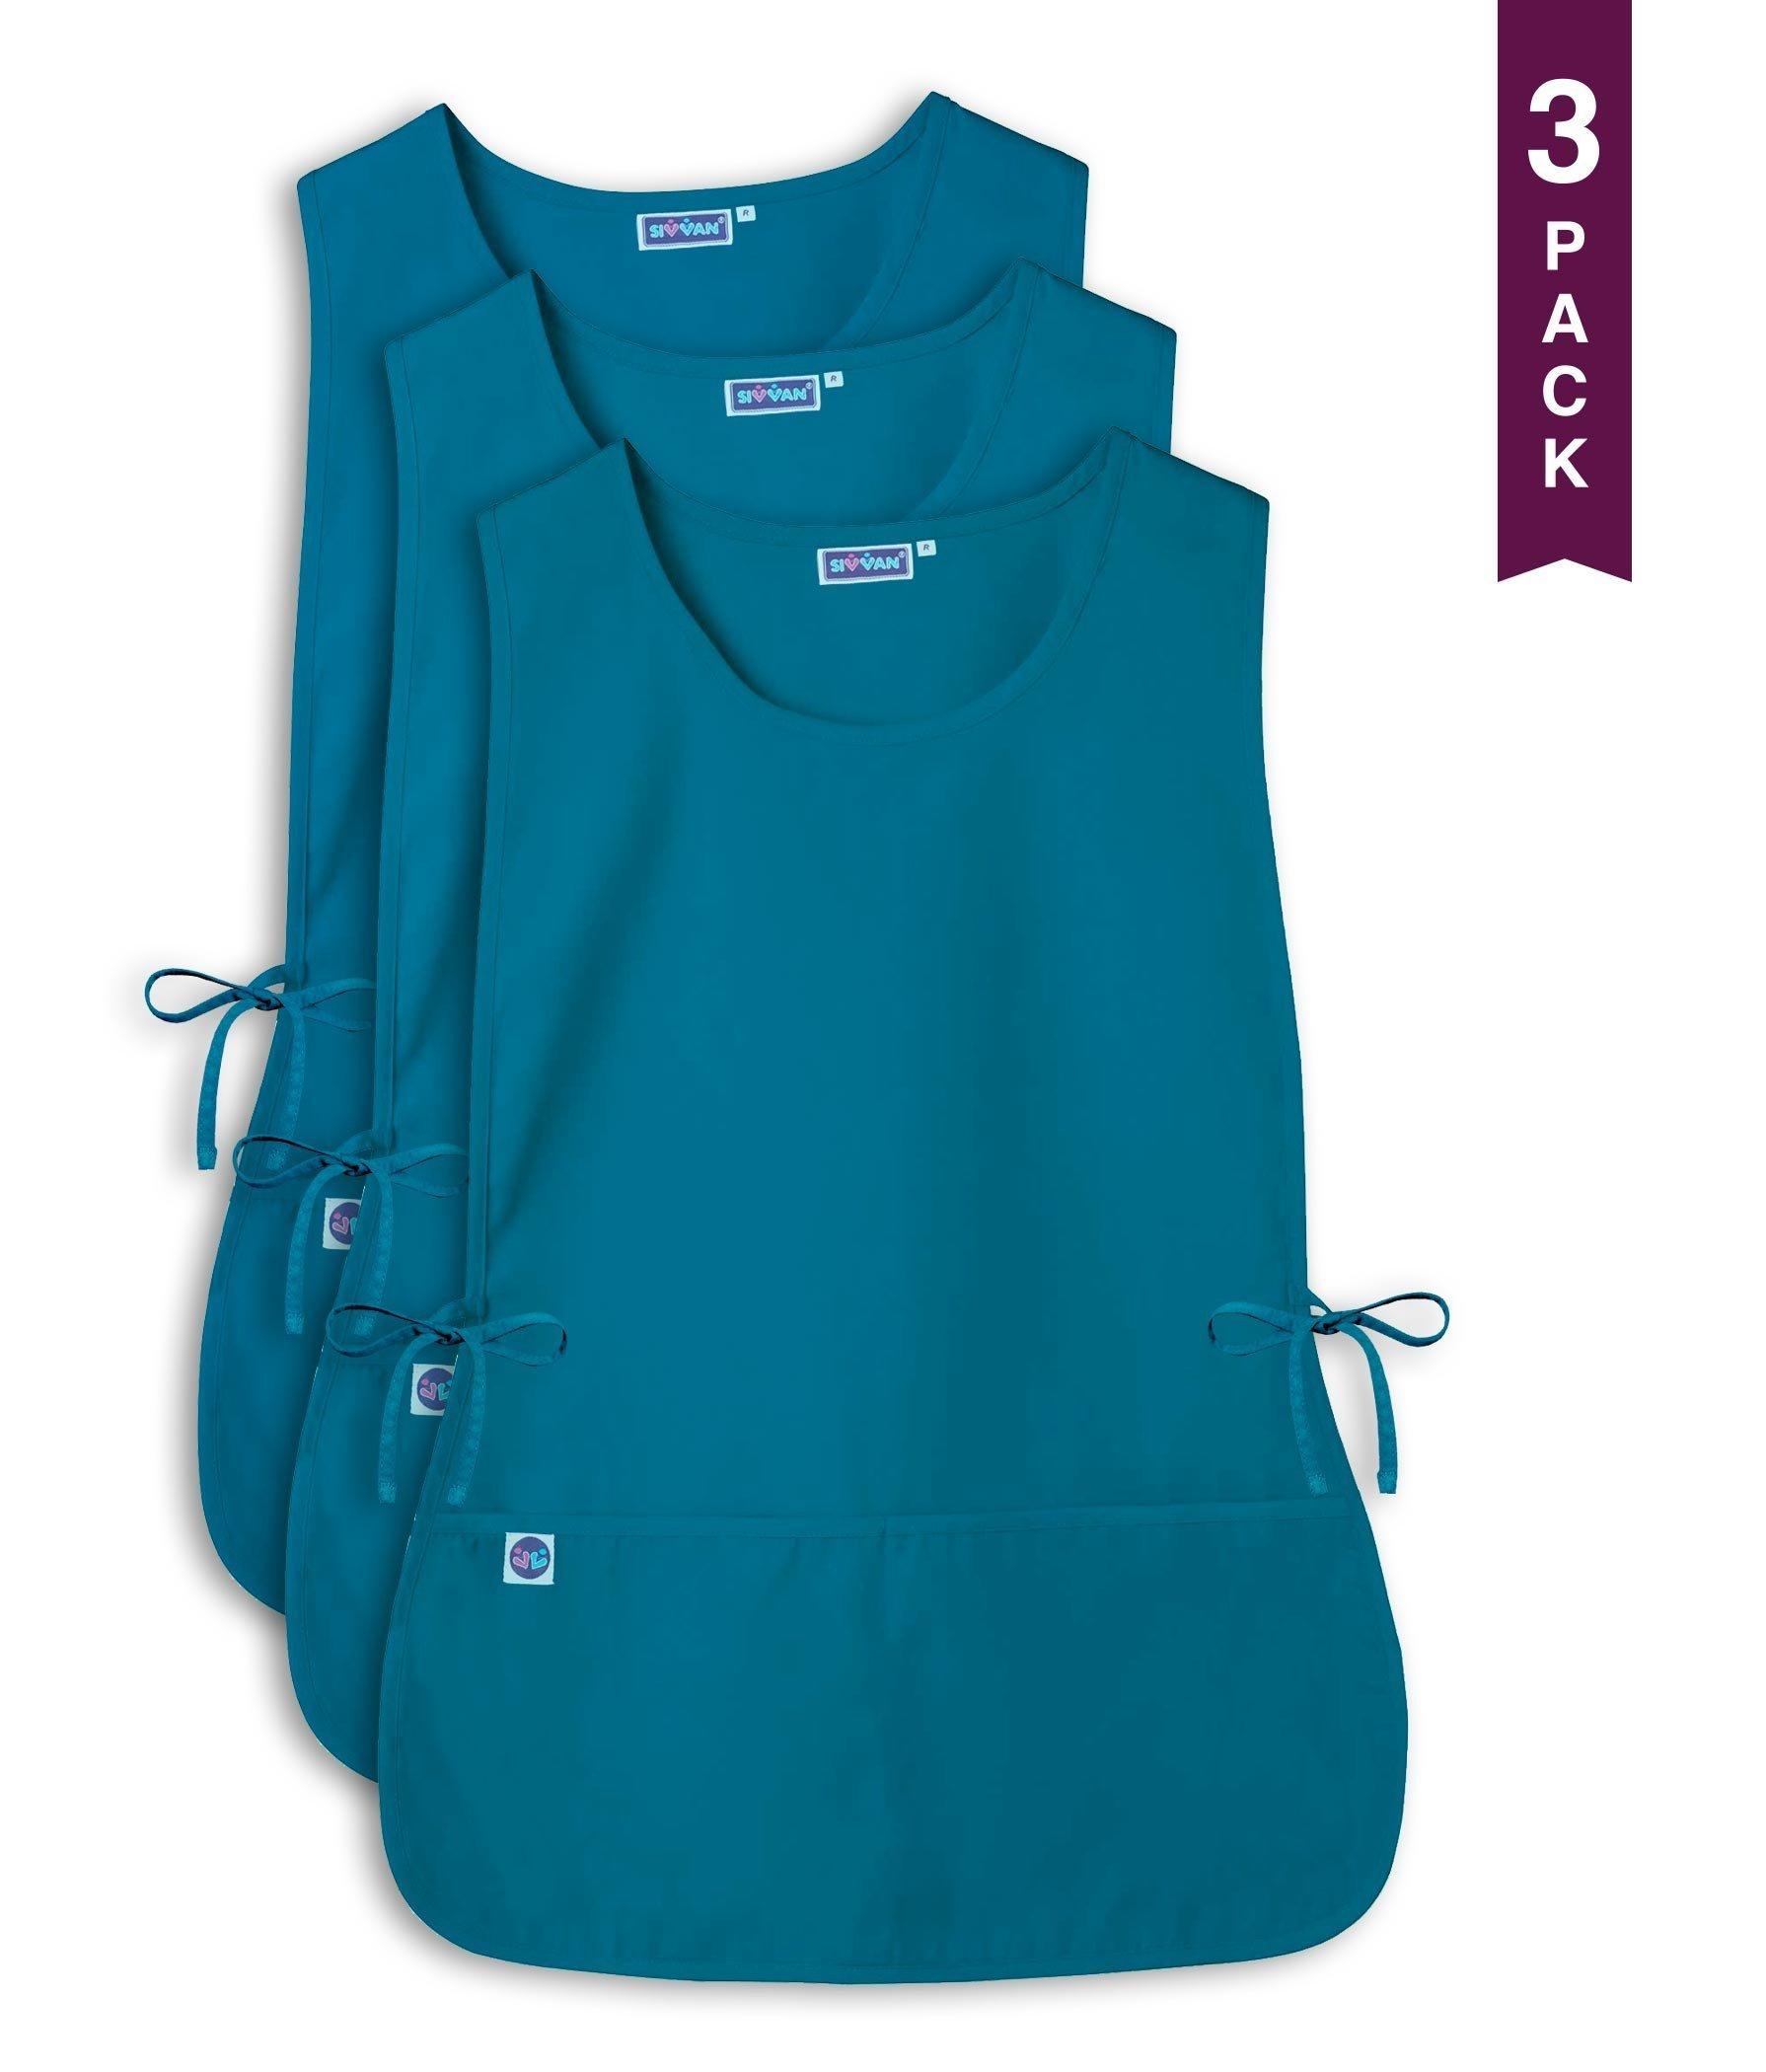 Sivvan Unisex Cobbler Apron - Adjustable Waist Ties, 2 Deep front pockets (3 Pack) - Teal Blue - R